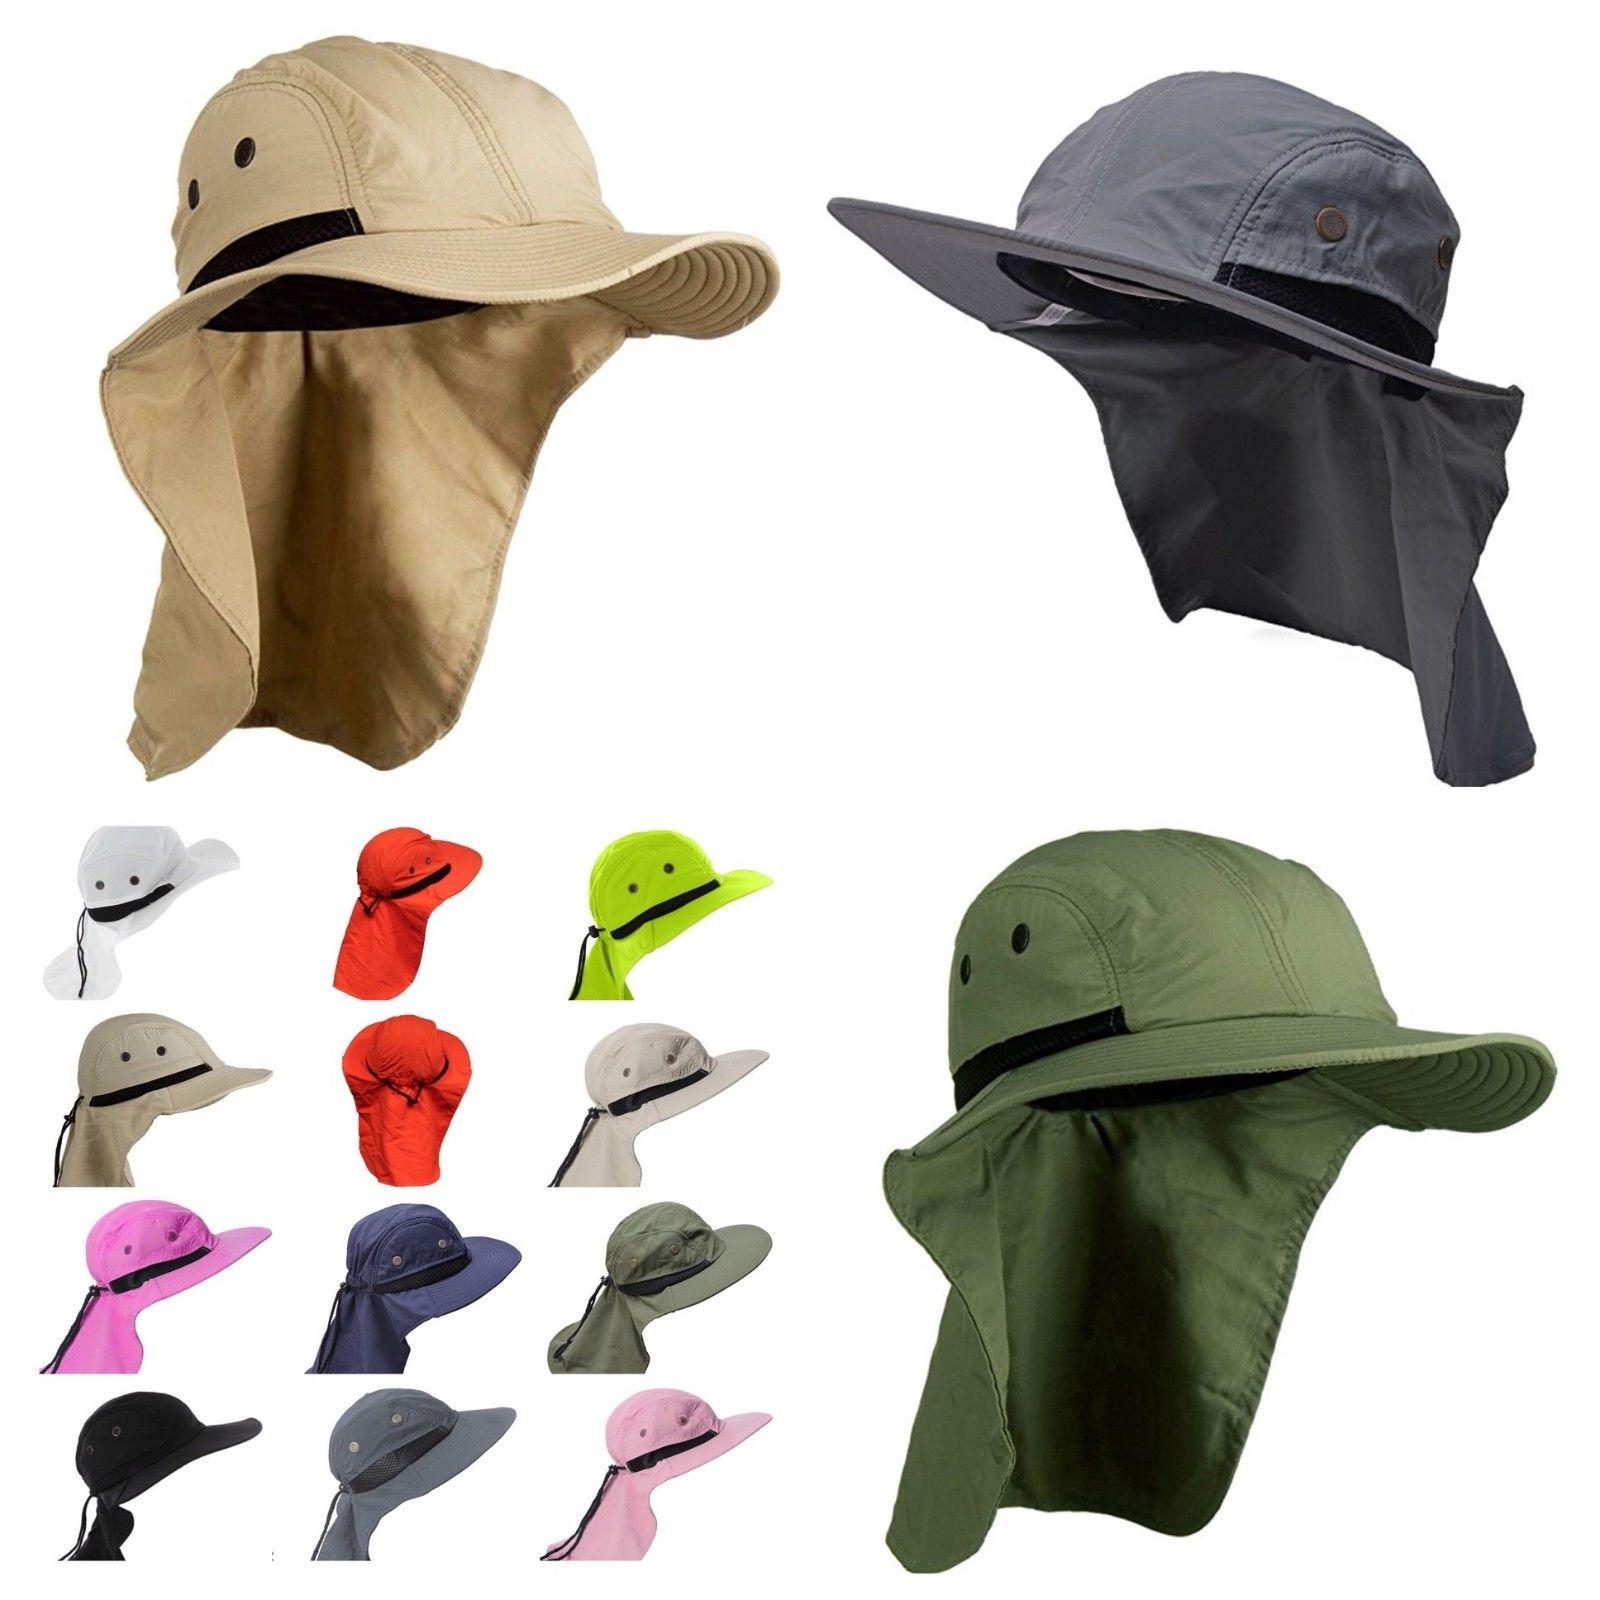 3f3b4460498 Boonie Snap Hat Brim Ear Neck Cover Sun Flap Cap Hunting Fis